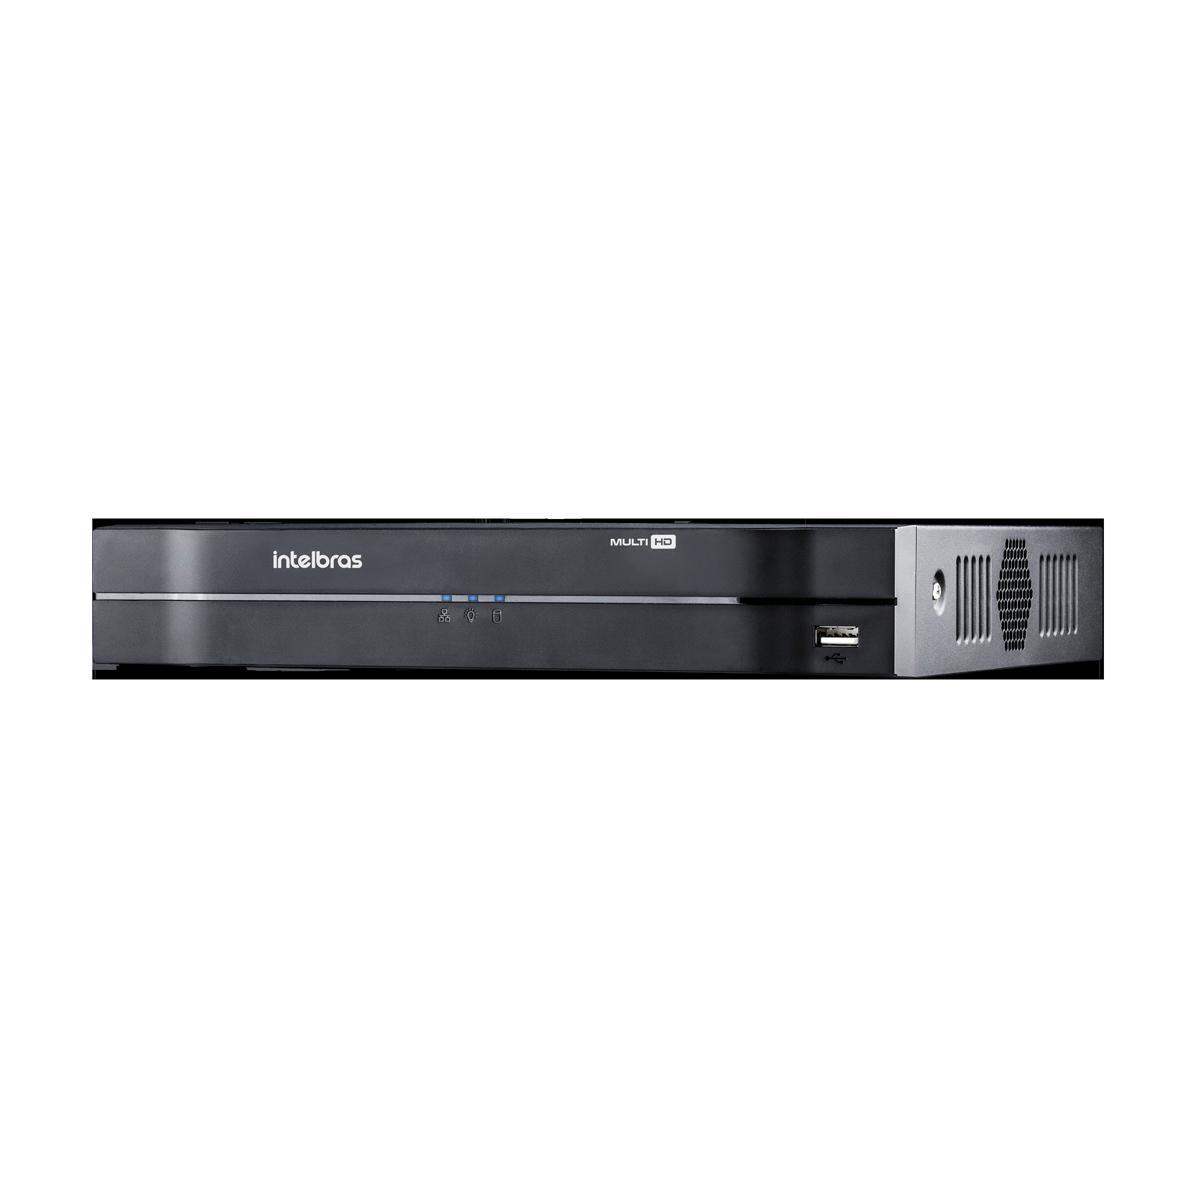 Gravador digital de vídeo 4 canais MHDX 1104